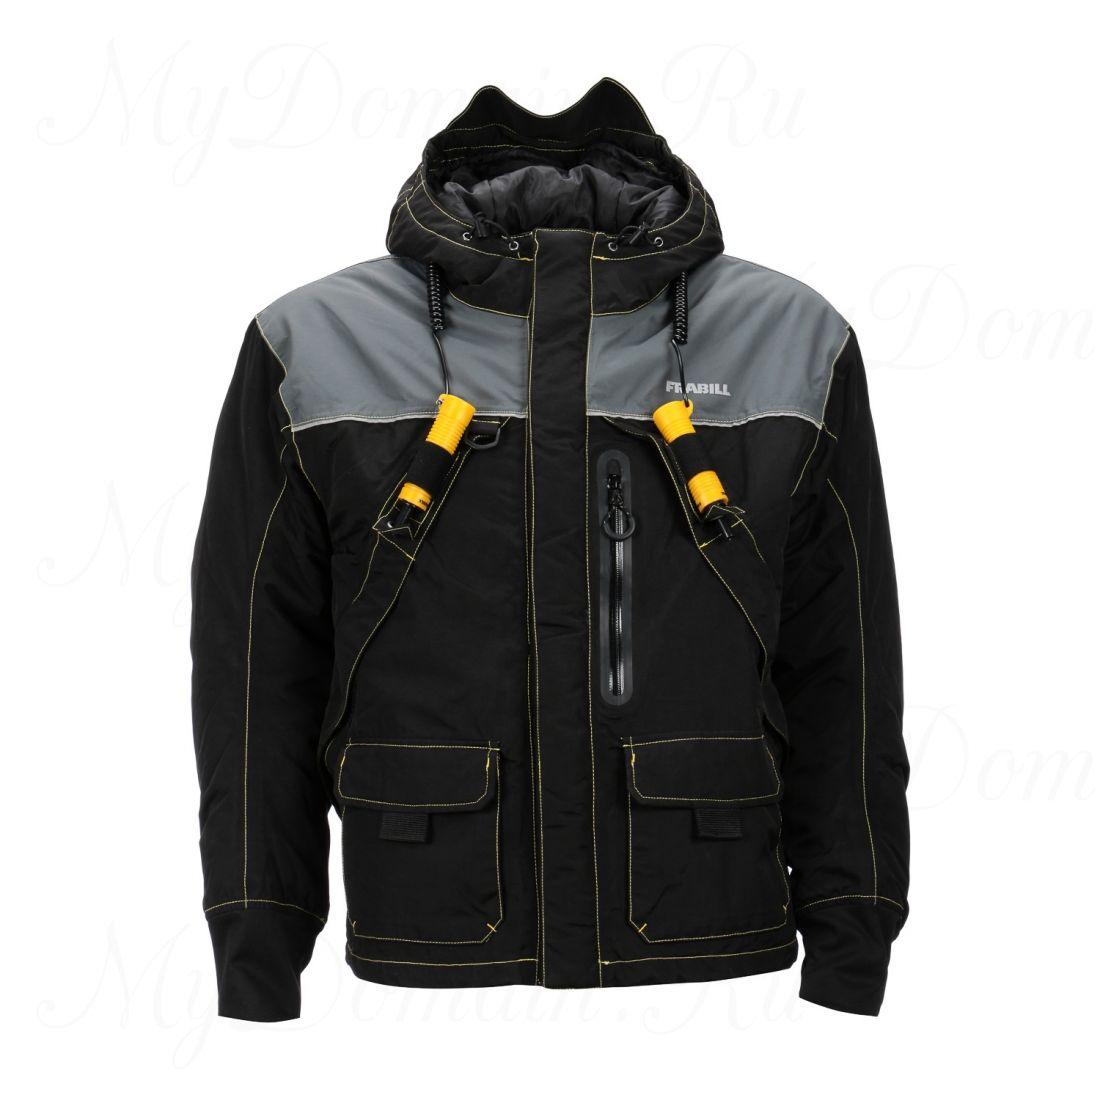 Куртка зимняя Frabill I3 Jacket, Black,размер XL